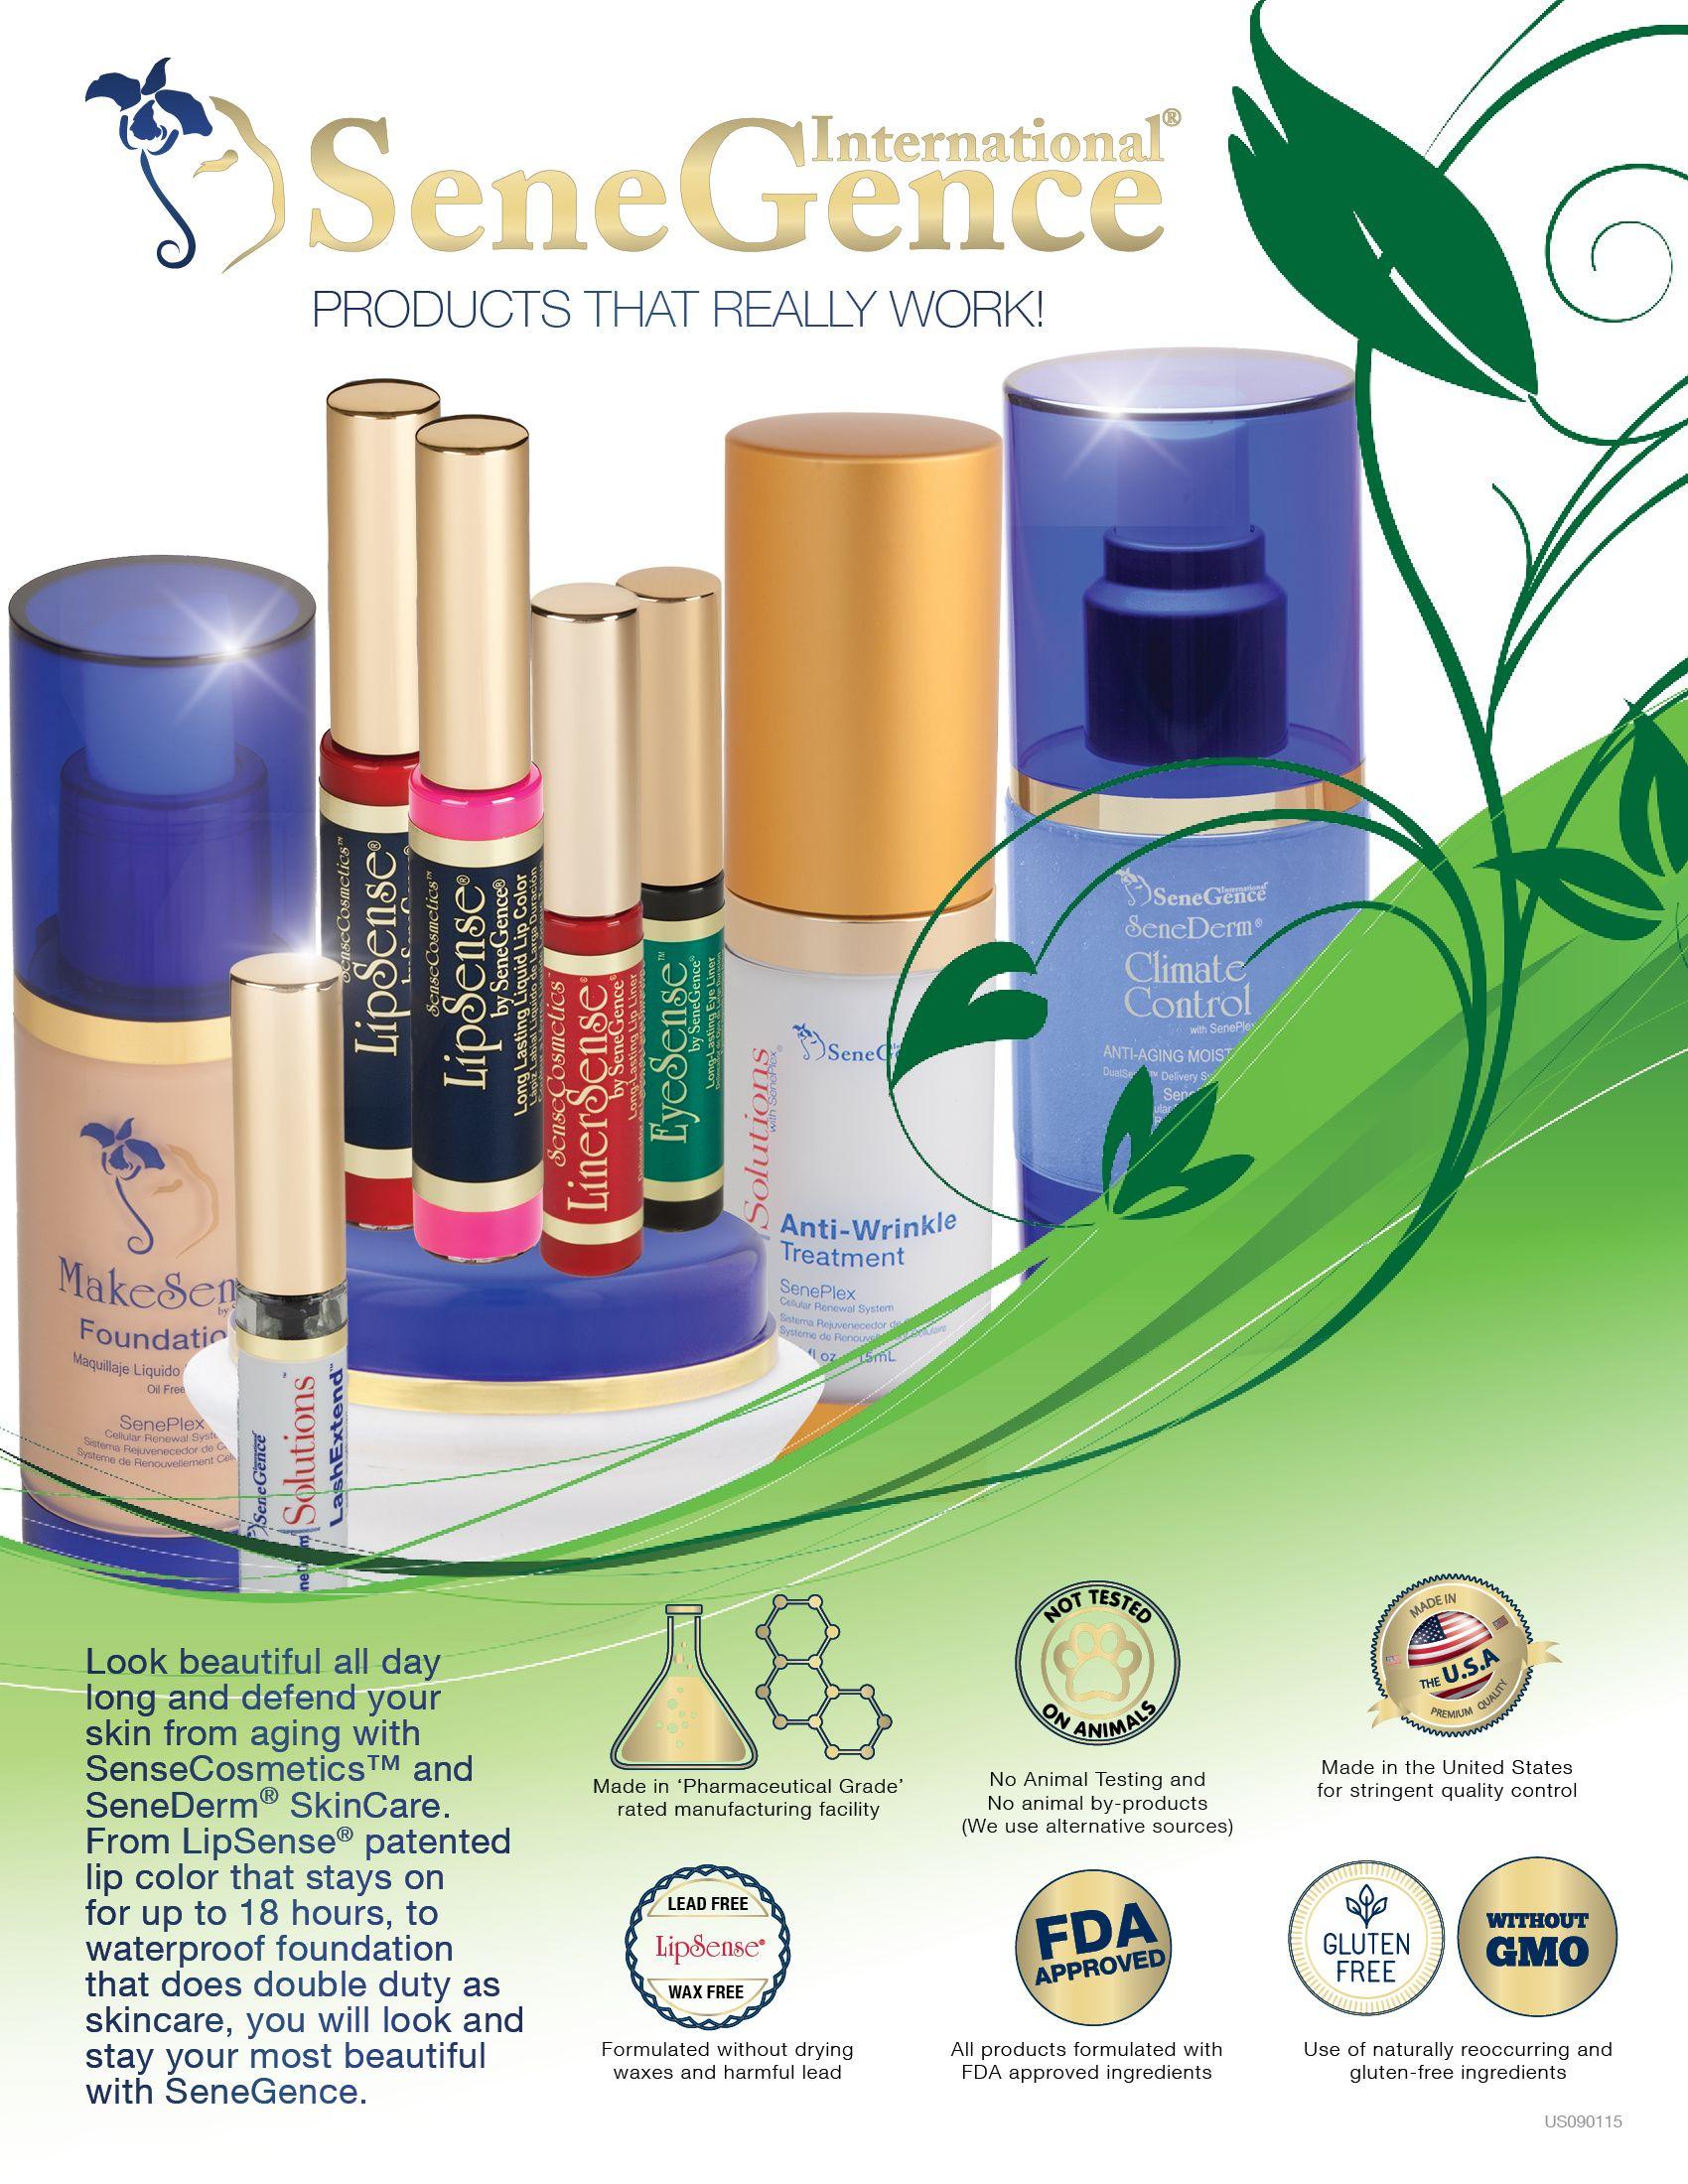 SeneGence products are GMOfree, Glutenfree, animal